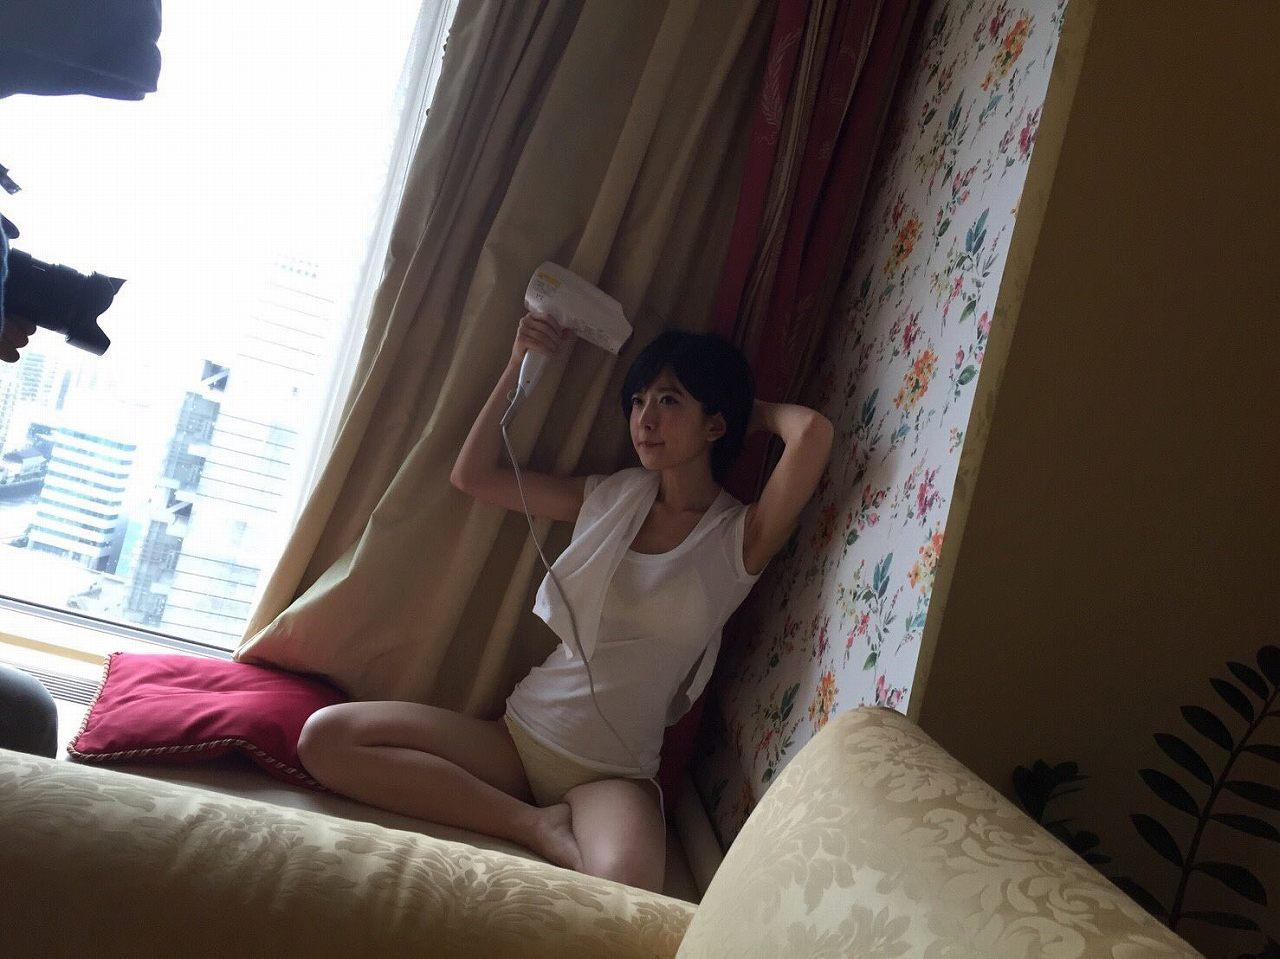 「EX (イーエックス) 大衆 2016年10月号」須藤凜々花の下着グラビアオフショット